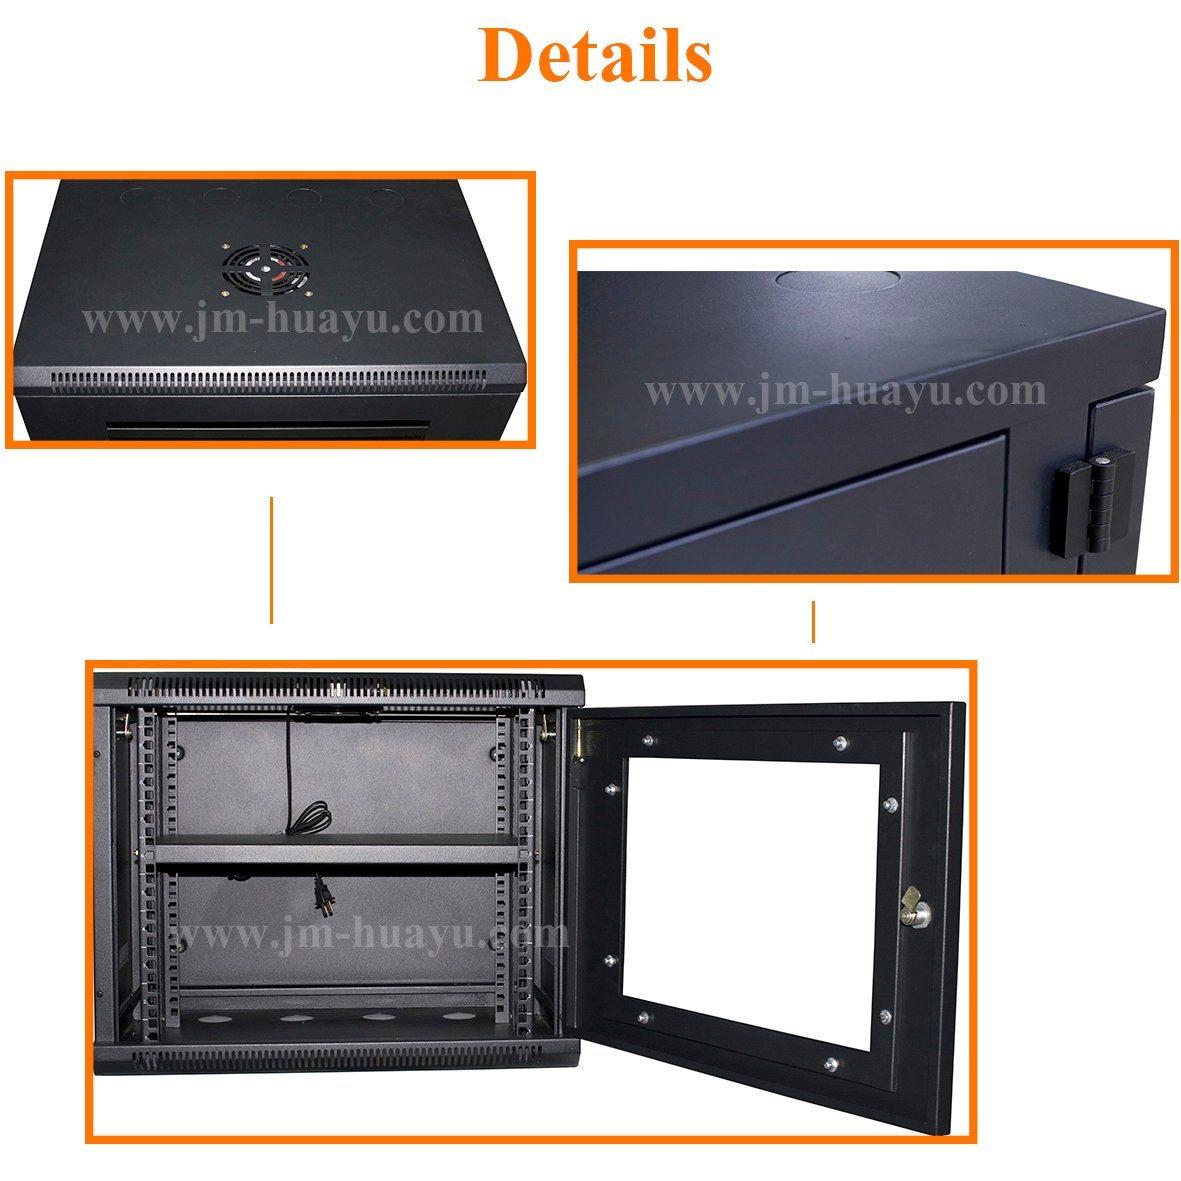 Powder Coating Black Telecom Cabinet Network Cabinet 19in Standard